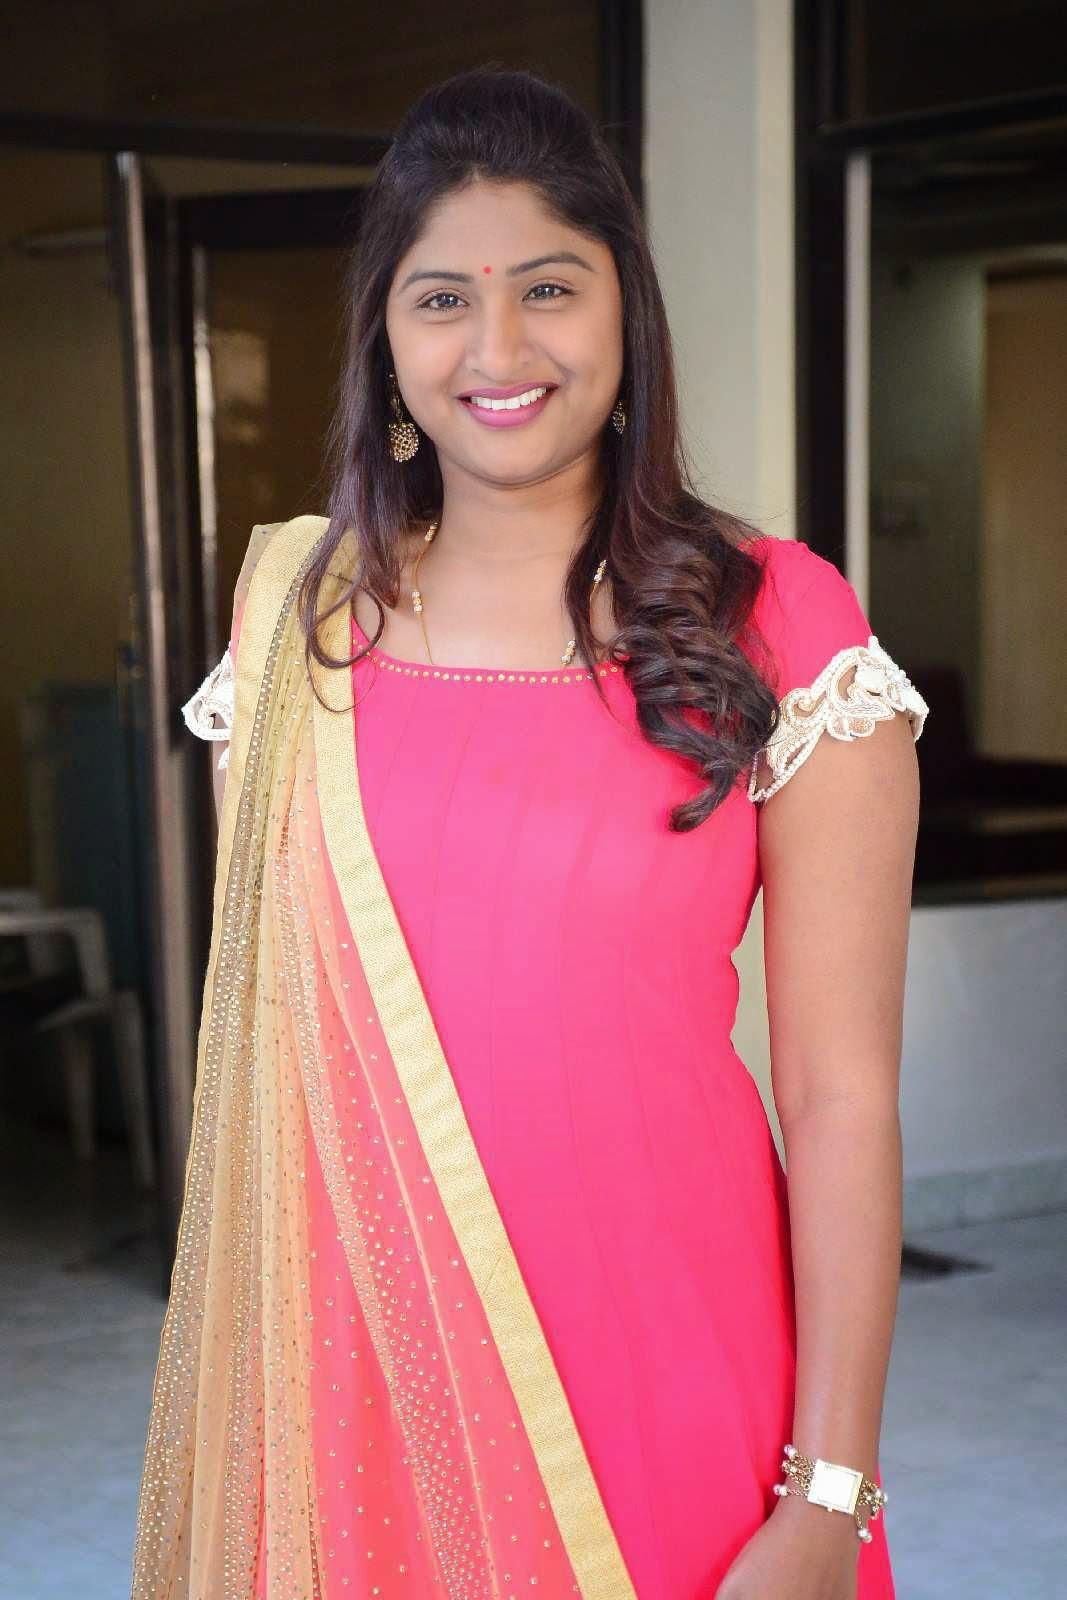 Actress Praveena Latest Cute Hot Beautiful Pink Dress Spicy Photos Gallery At GAMA Tollywood Music Awards 2015 Press Meet